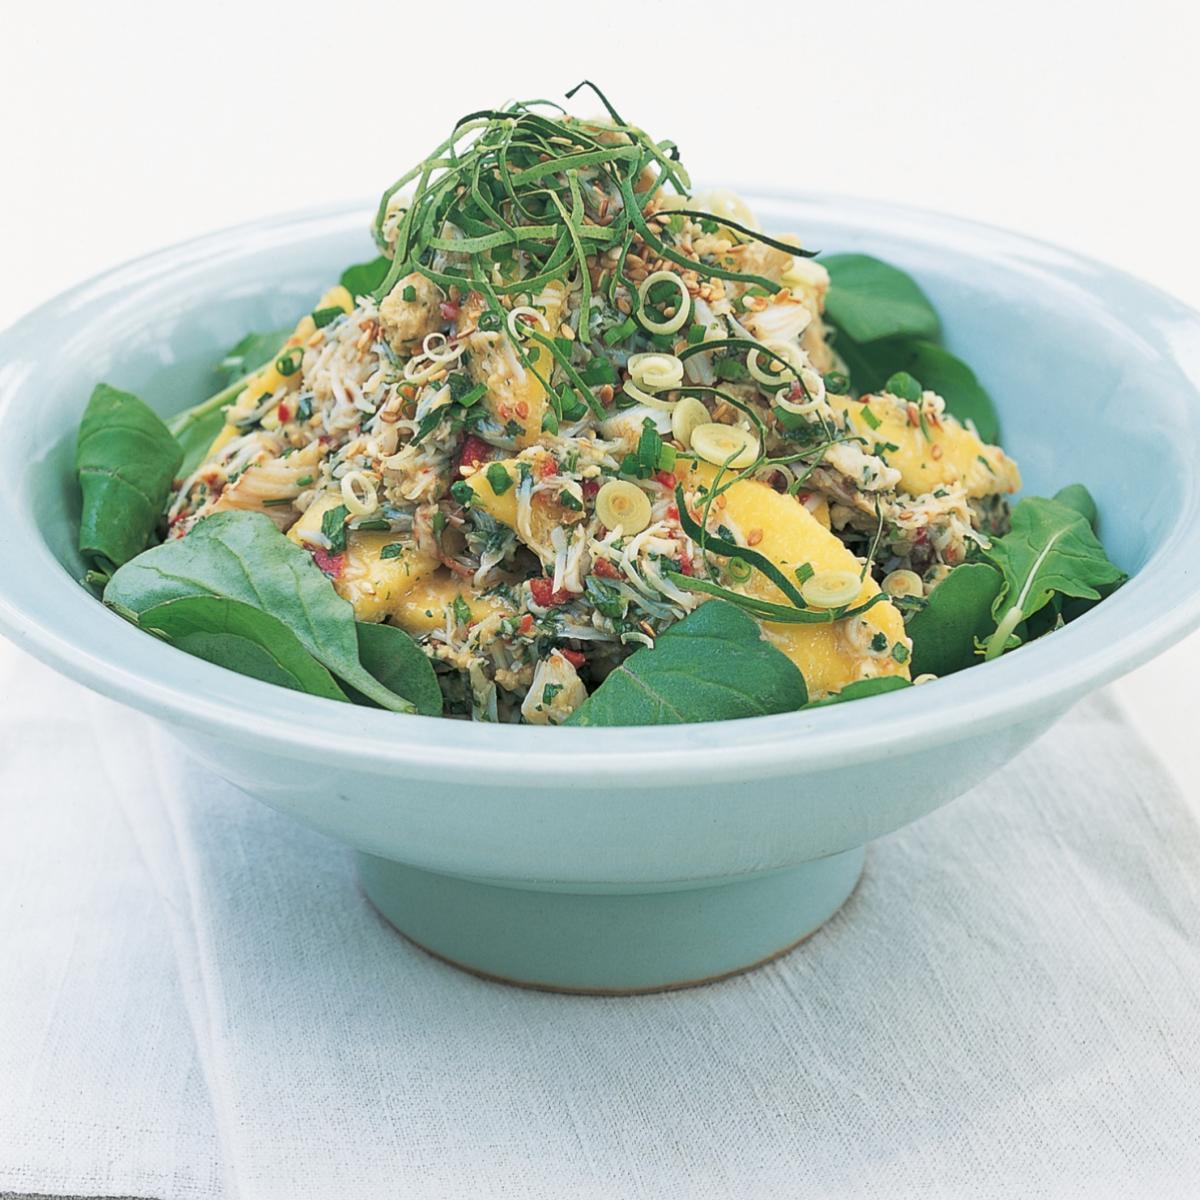 A picture of Delia's Thai Crab Salad with Mango recipe